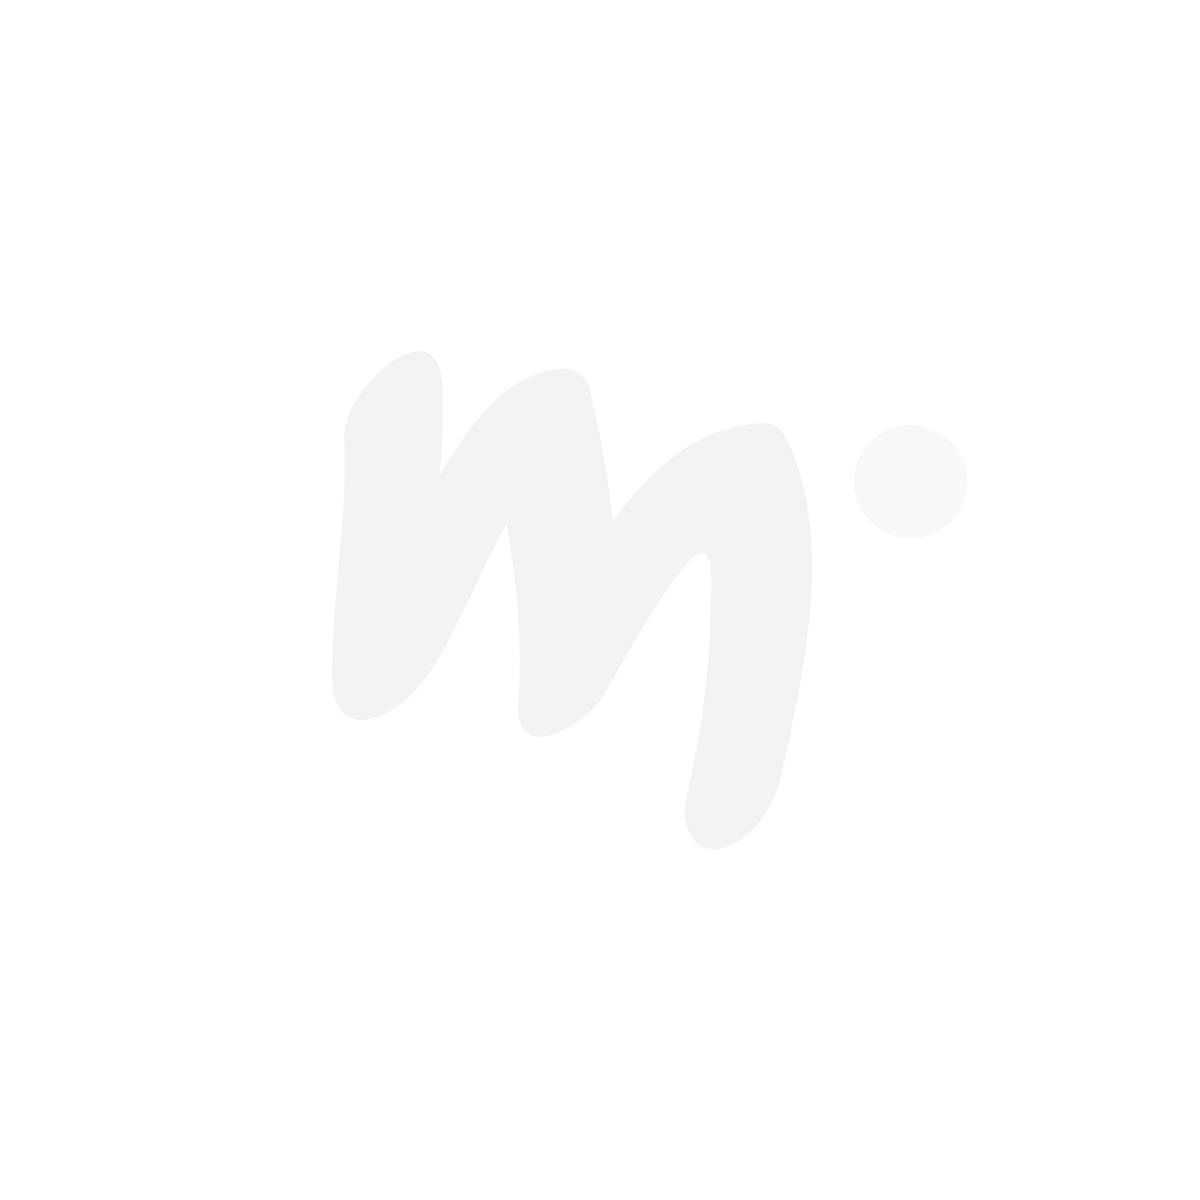 Peppi Pitkätossu Pilkukas-leggingsit mustavalkoinen